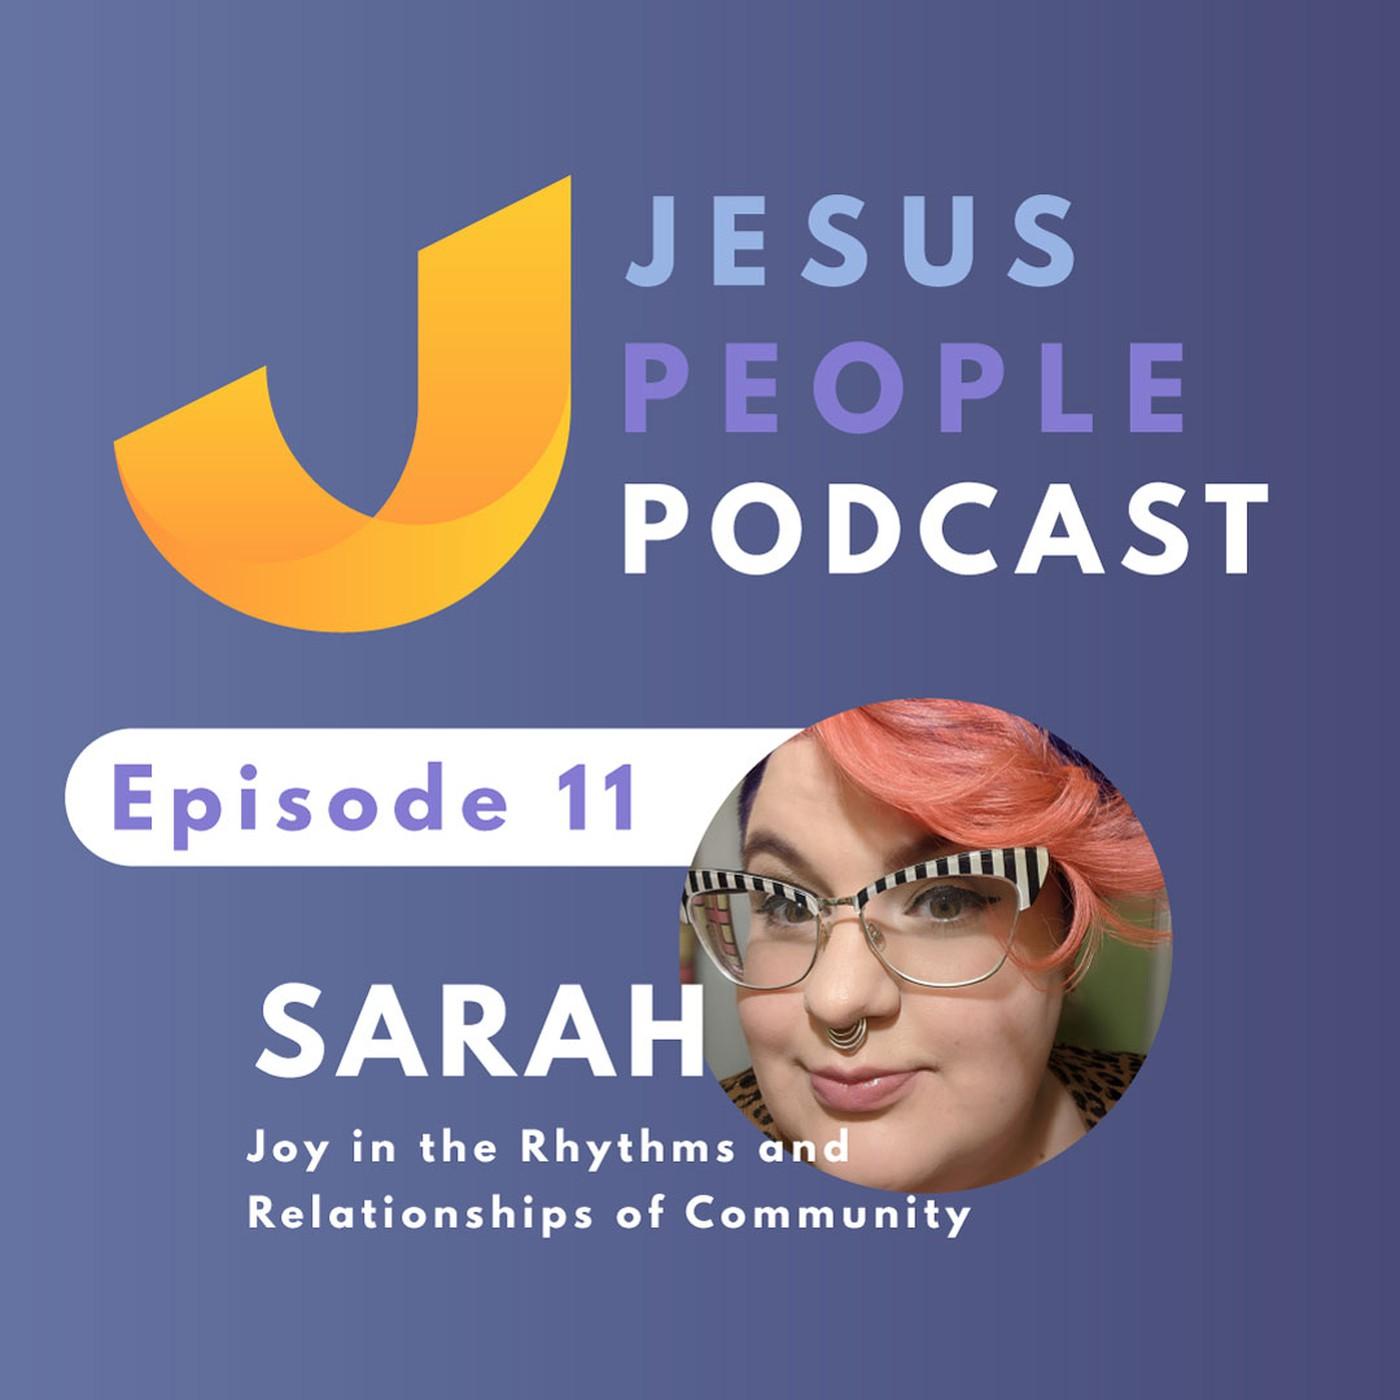 The Jesus People Podcast